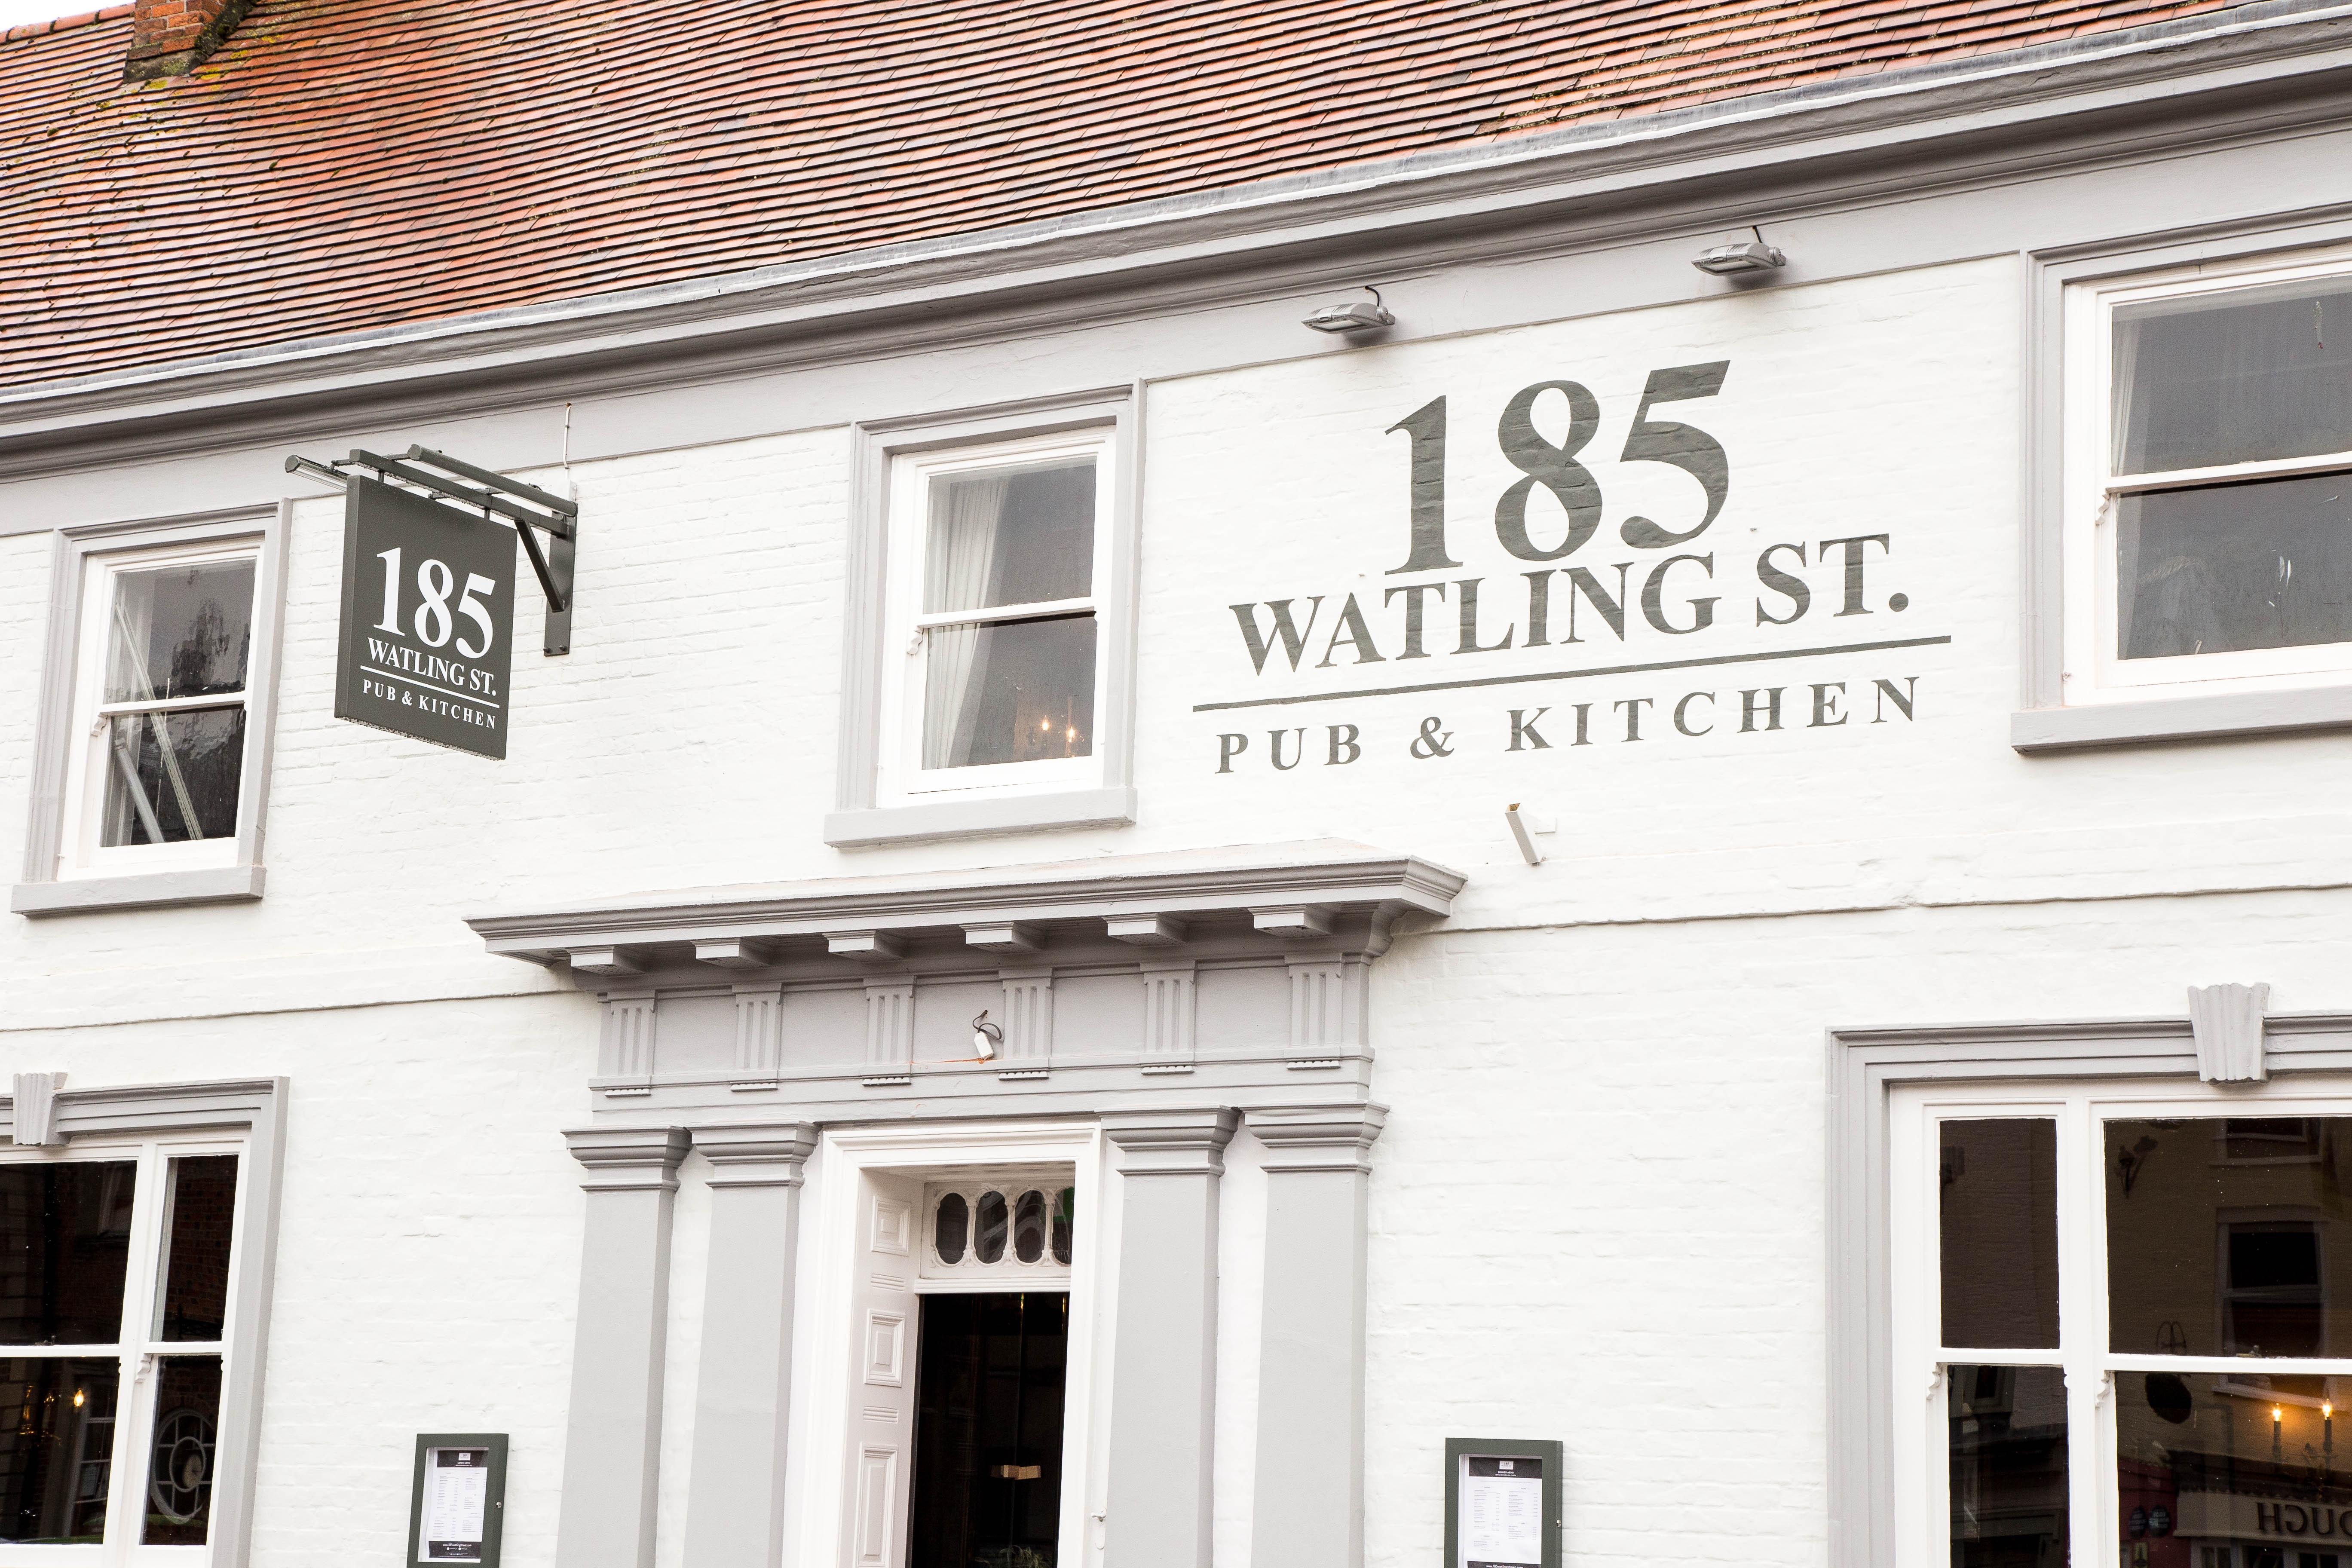 185 Watling St. Pub & Kitchen | Towcester Pub Reviews | DesignMyNight